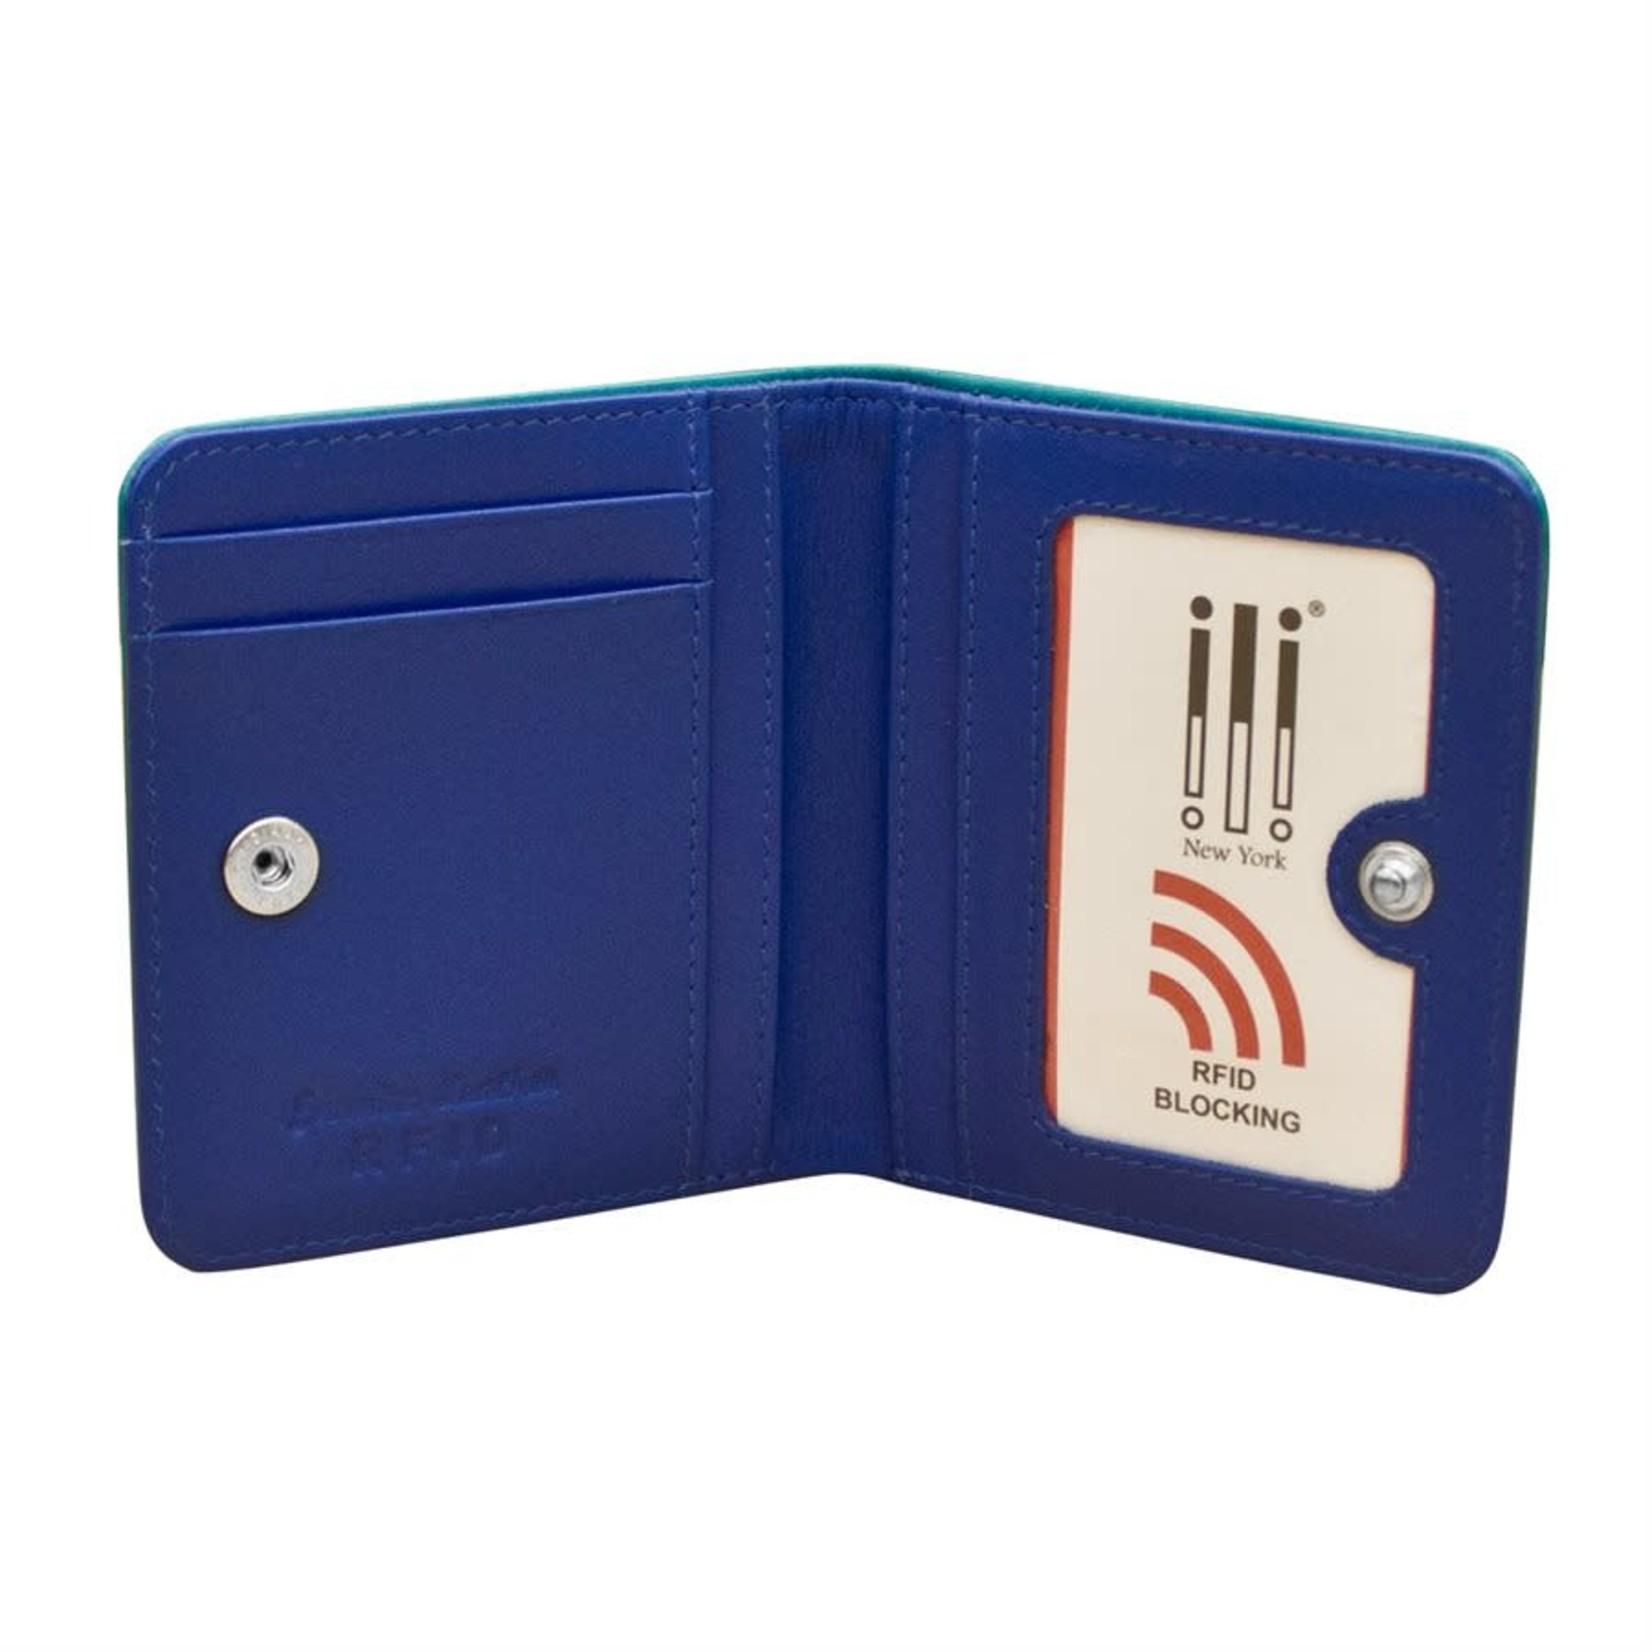 Leather Handbags and Accessories 7831 Aqua/Cobalt - RFID Mini Wallet Two Toned